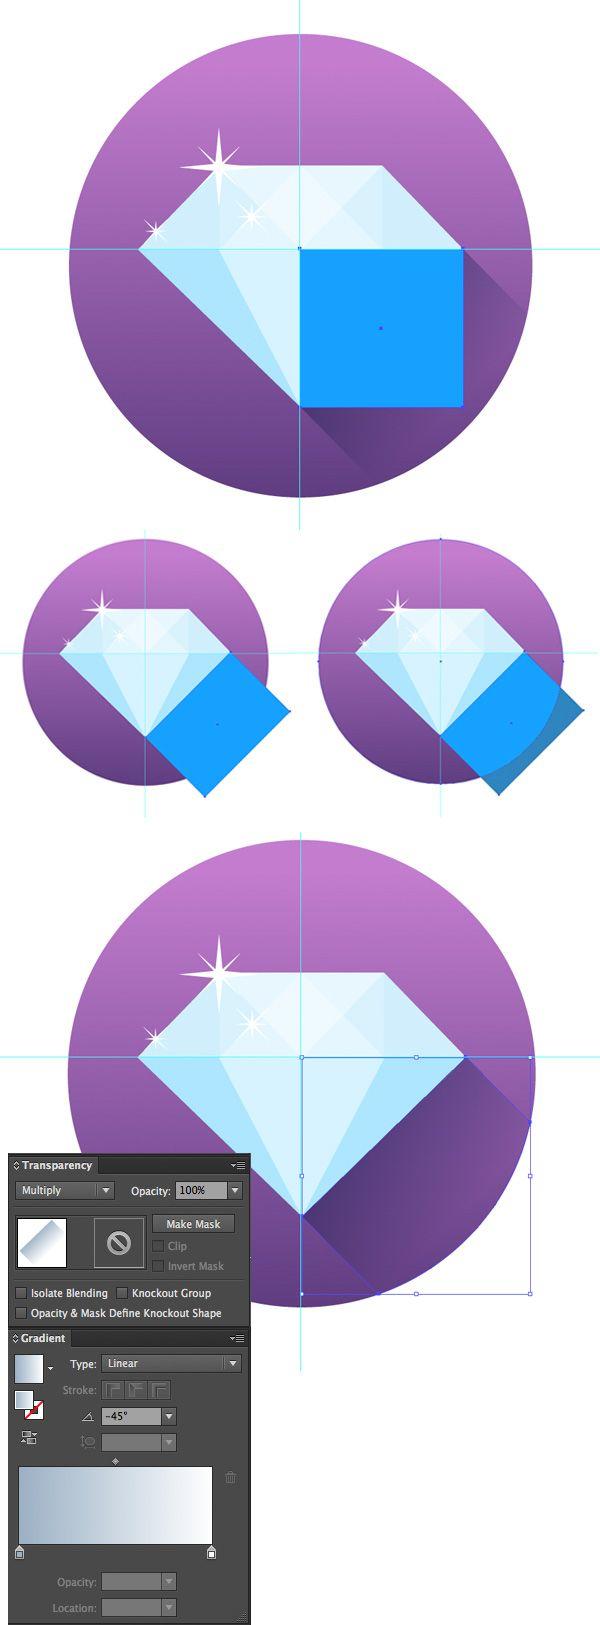 adobe illustrator icon tutorial